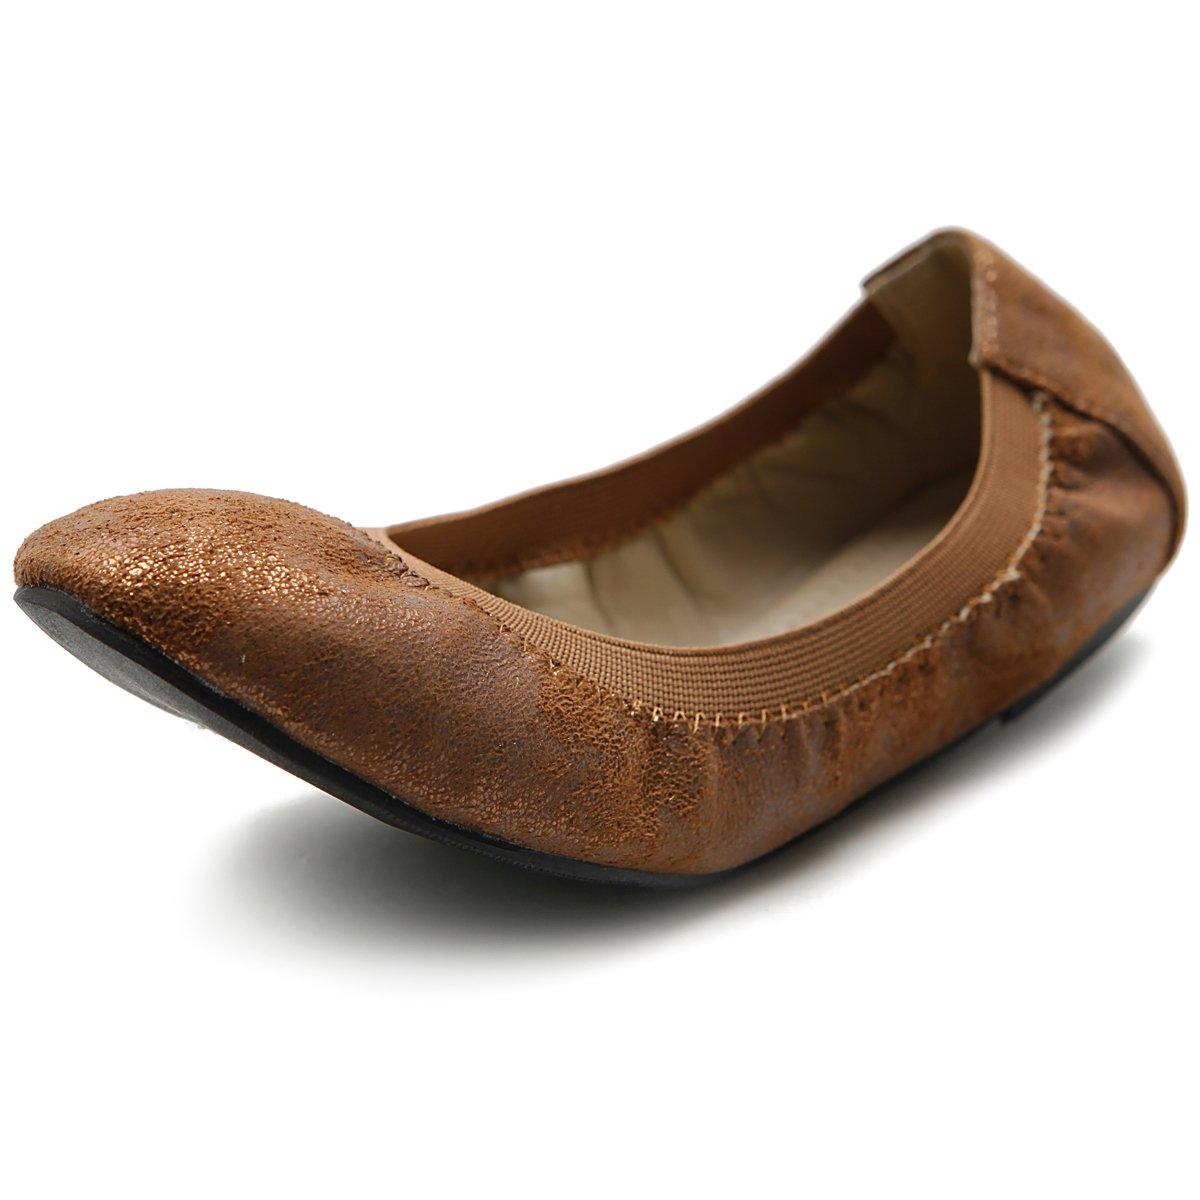 Ollio Women's Shoe Comfort Multi Color Cute Ballet Flats B00LT42KL8 5.5 B(M) US|Brown